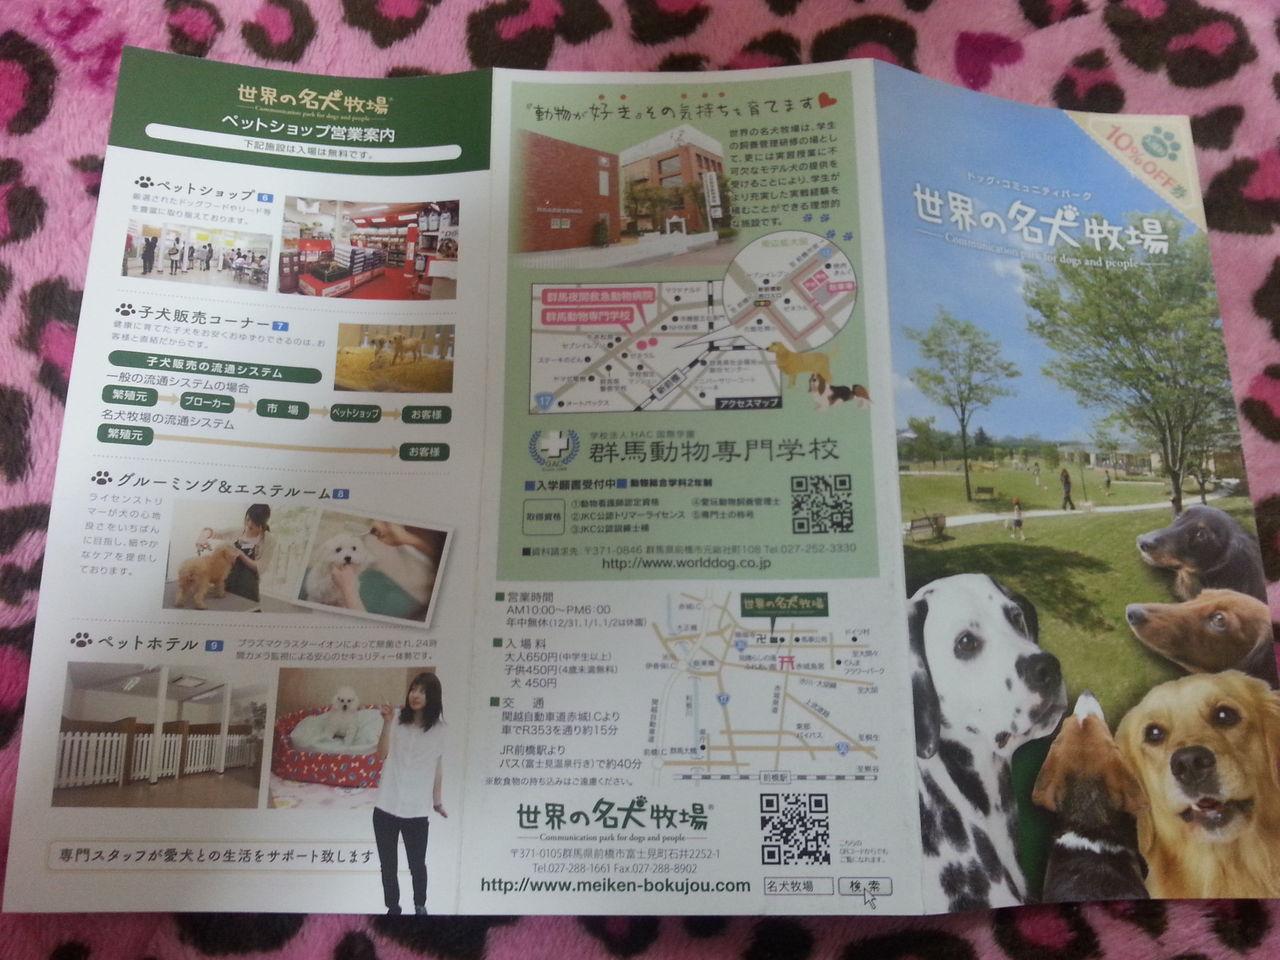 How about Gunma on GW (5)… Cheap B-Class spot-dog Zoo